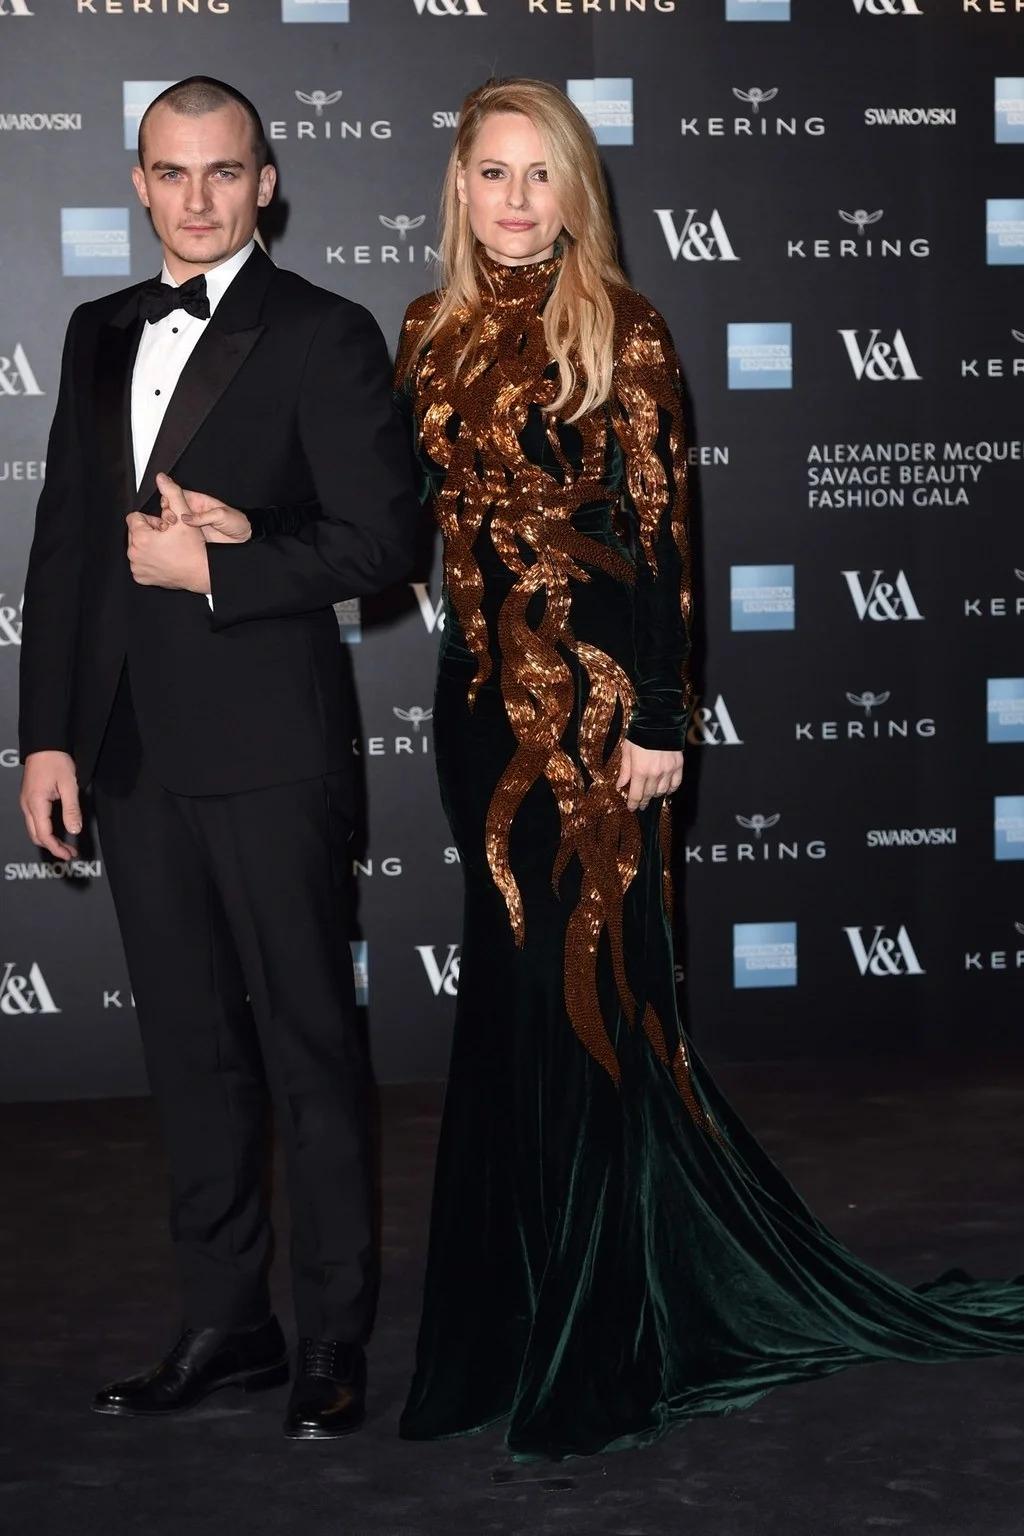 Rupert Friend và Aimee Mullins đều mặc trang phục của Alexander McQueen tại buổi triển lãm